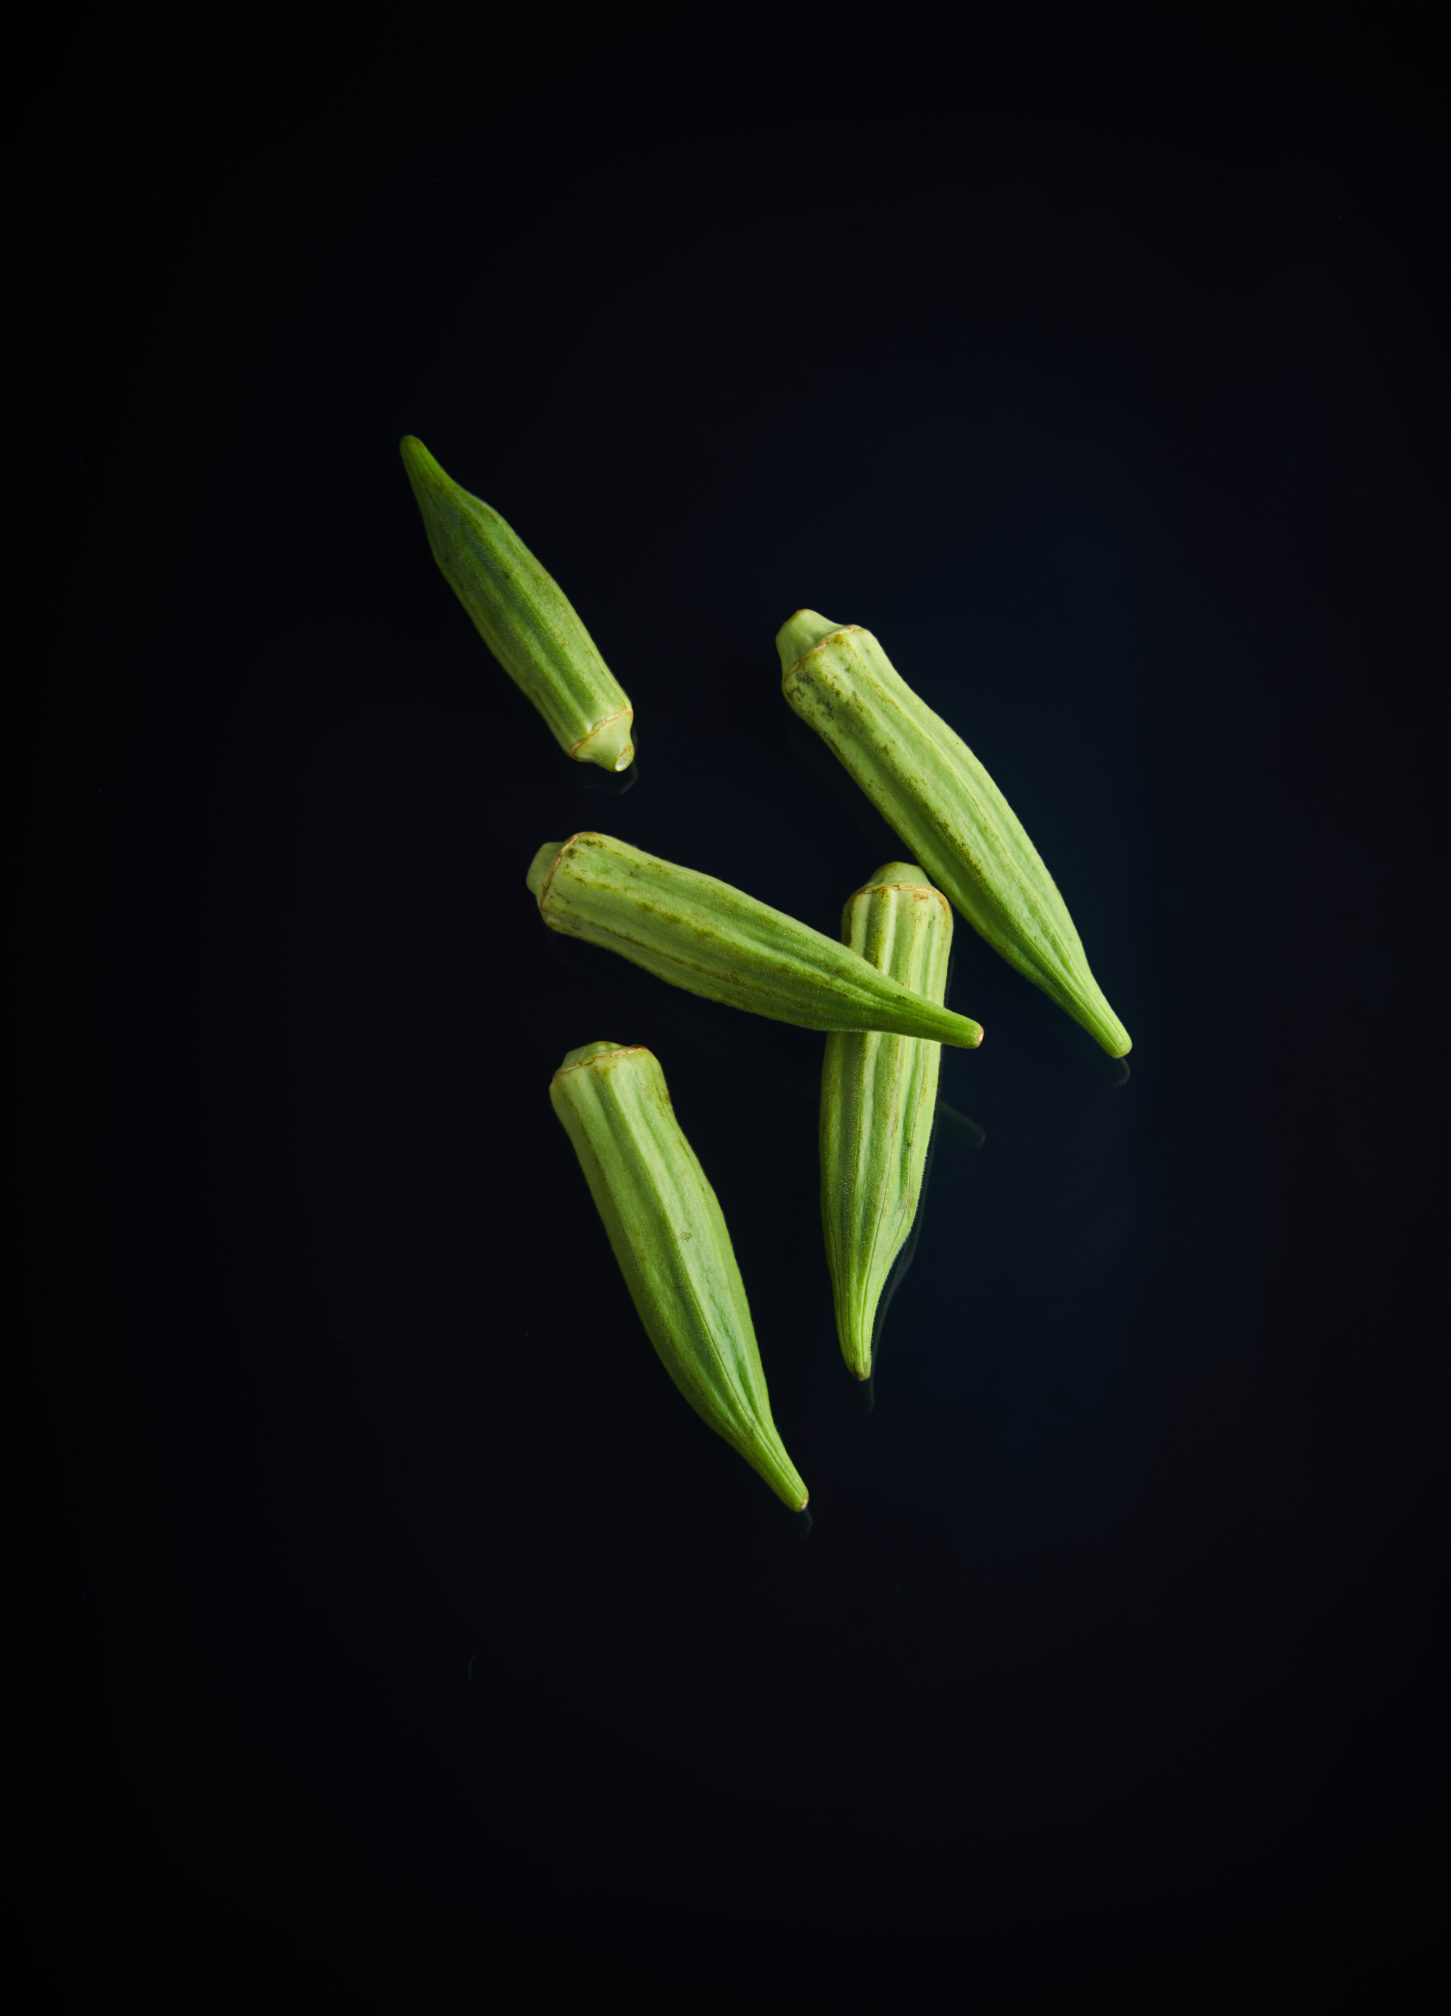 capexo-lilot-fruits-exotique-gombo-jordanie-honduras-usa-nicaragua